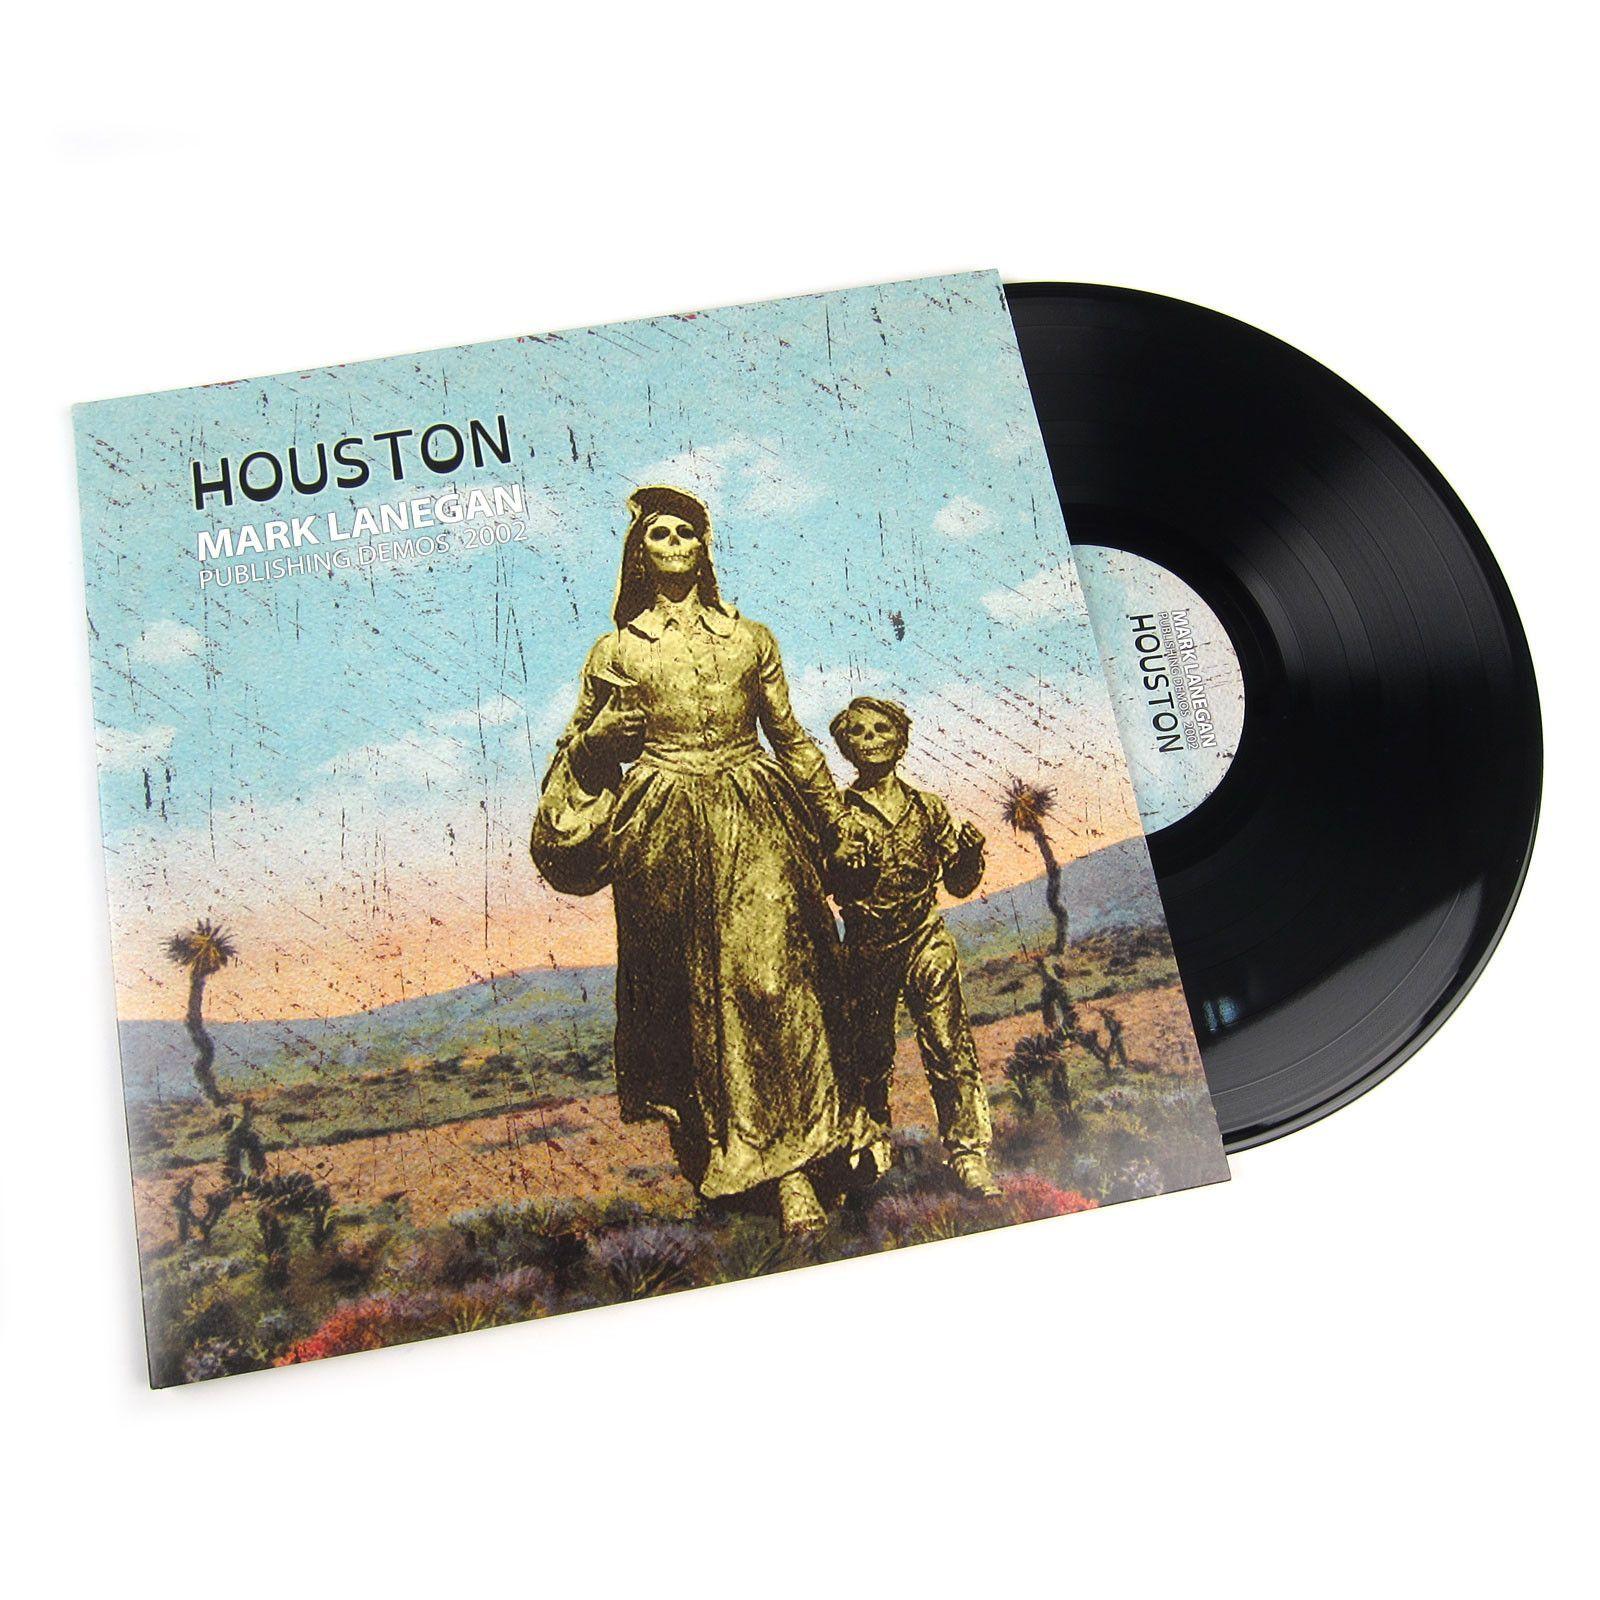 Mark Lanegan Houston Publishing Demos 2002 Vinyl Lp Mark Lanegan Houston Better Music